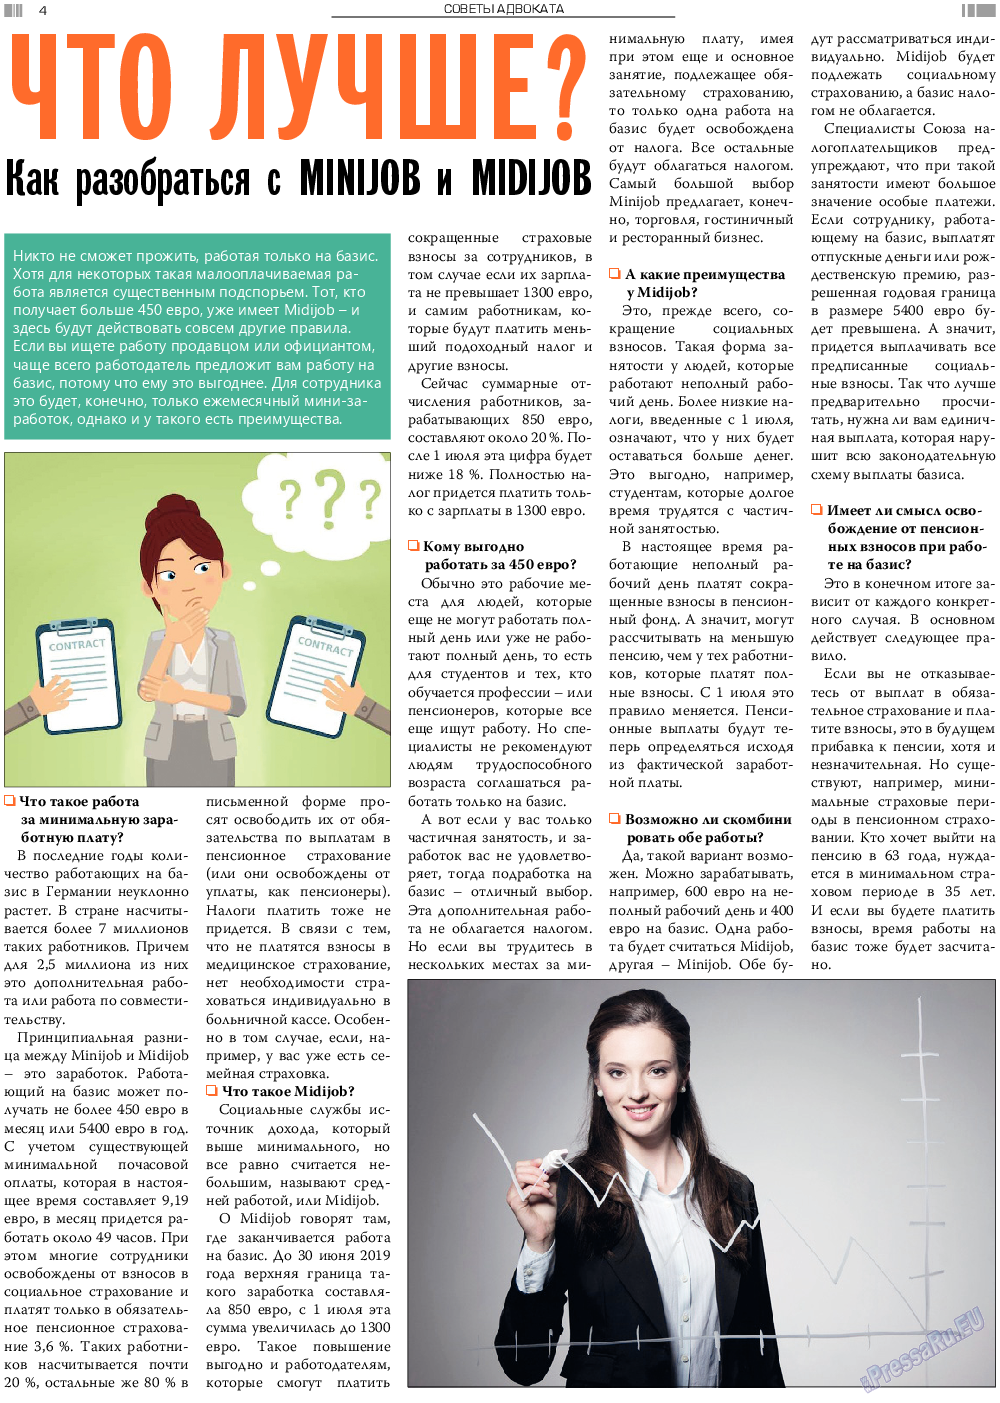 Анонс (газета). 2019 год, номер 8, стр. 4